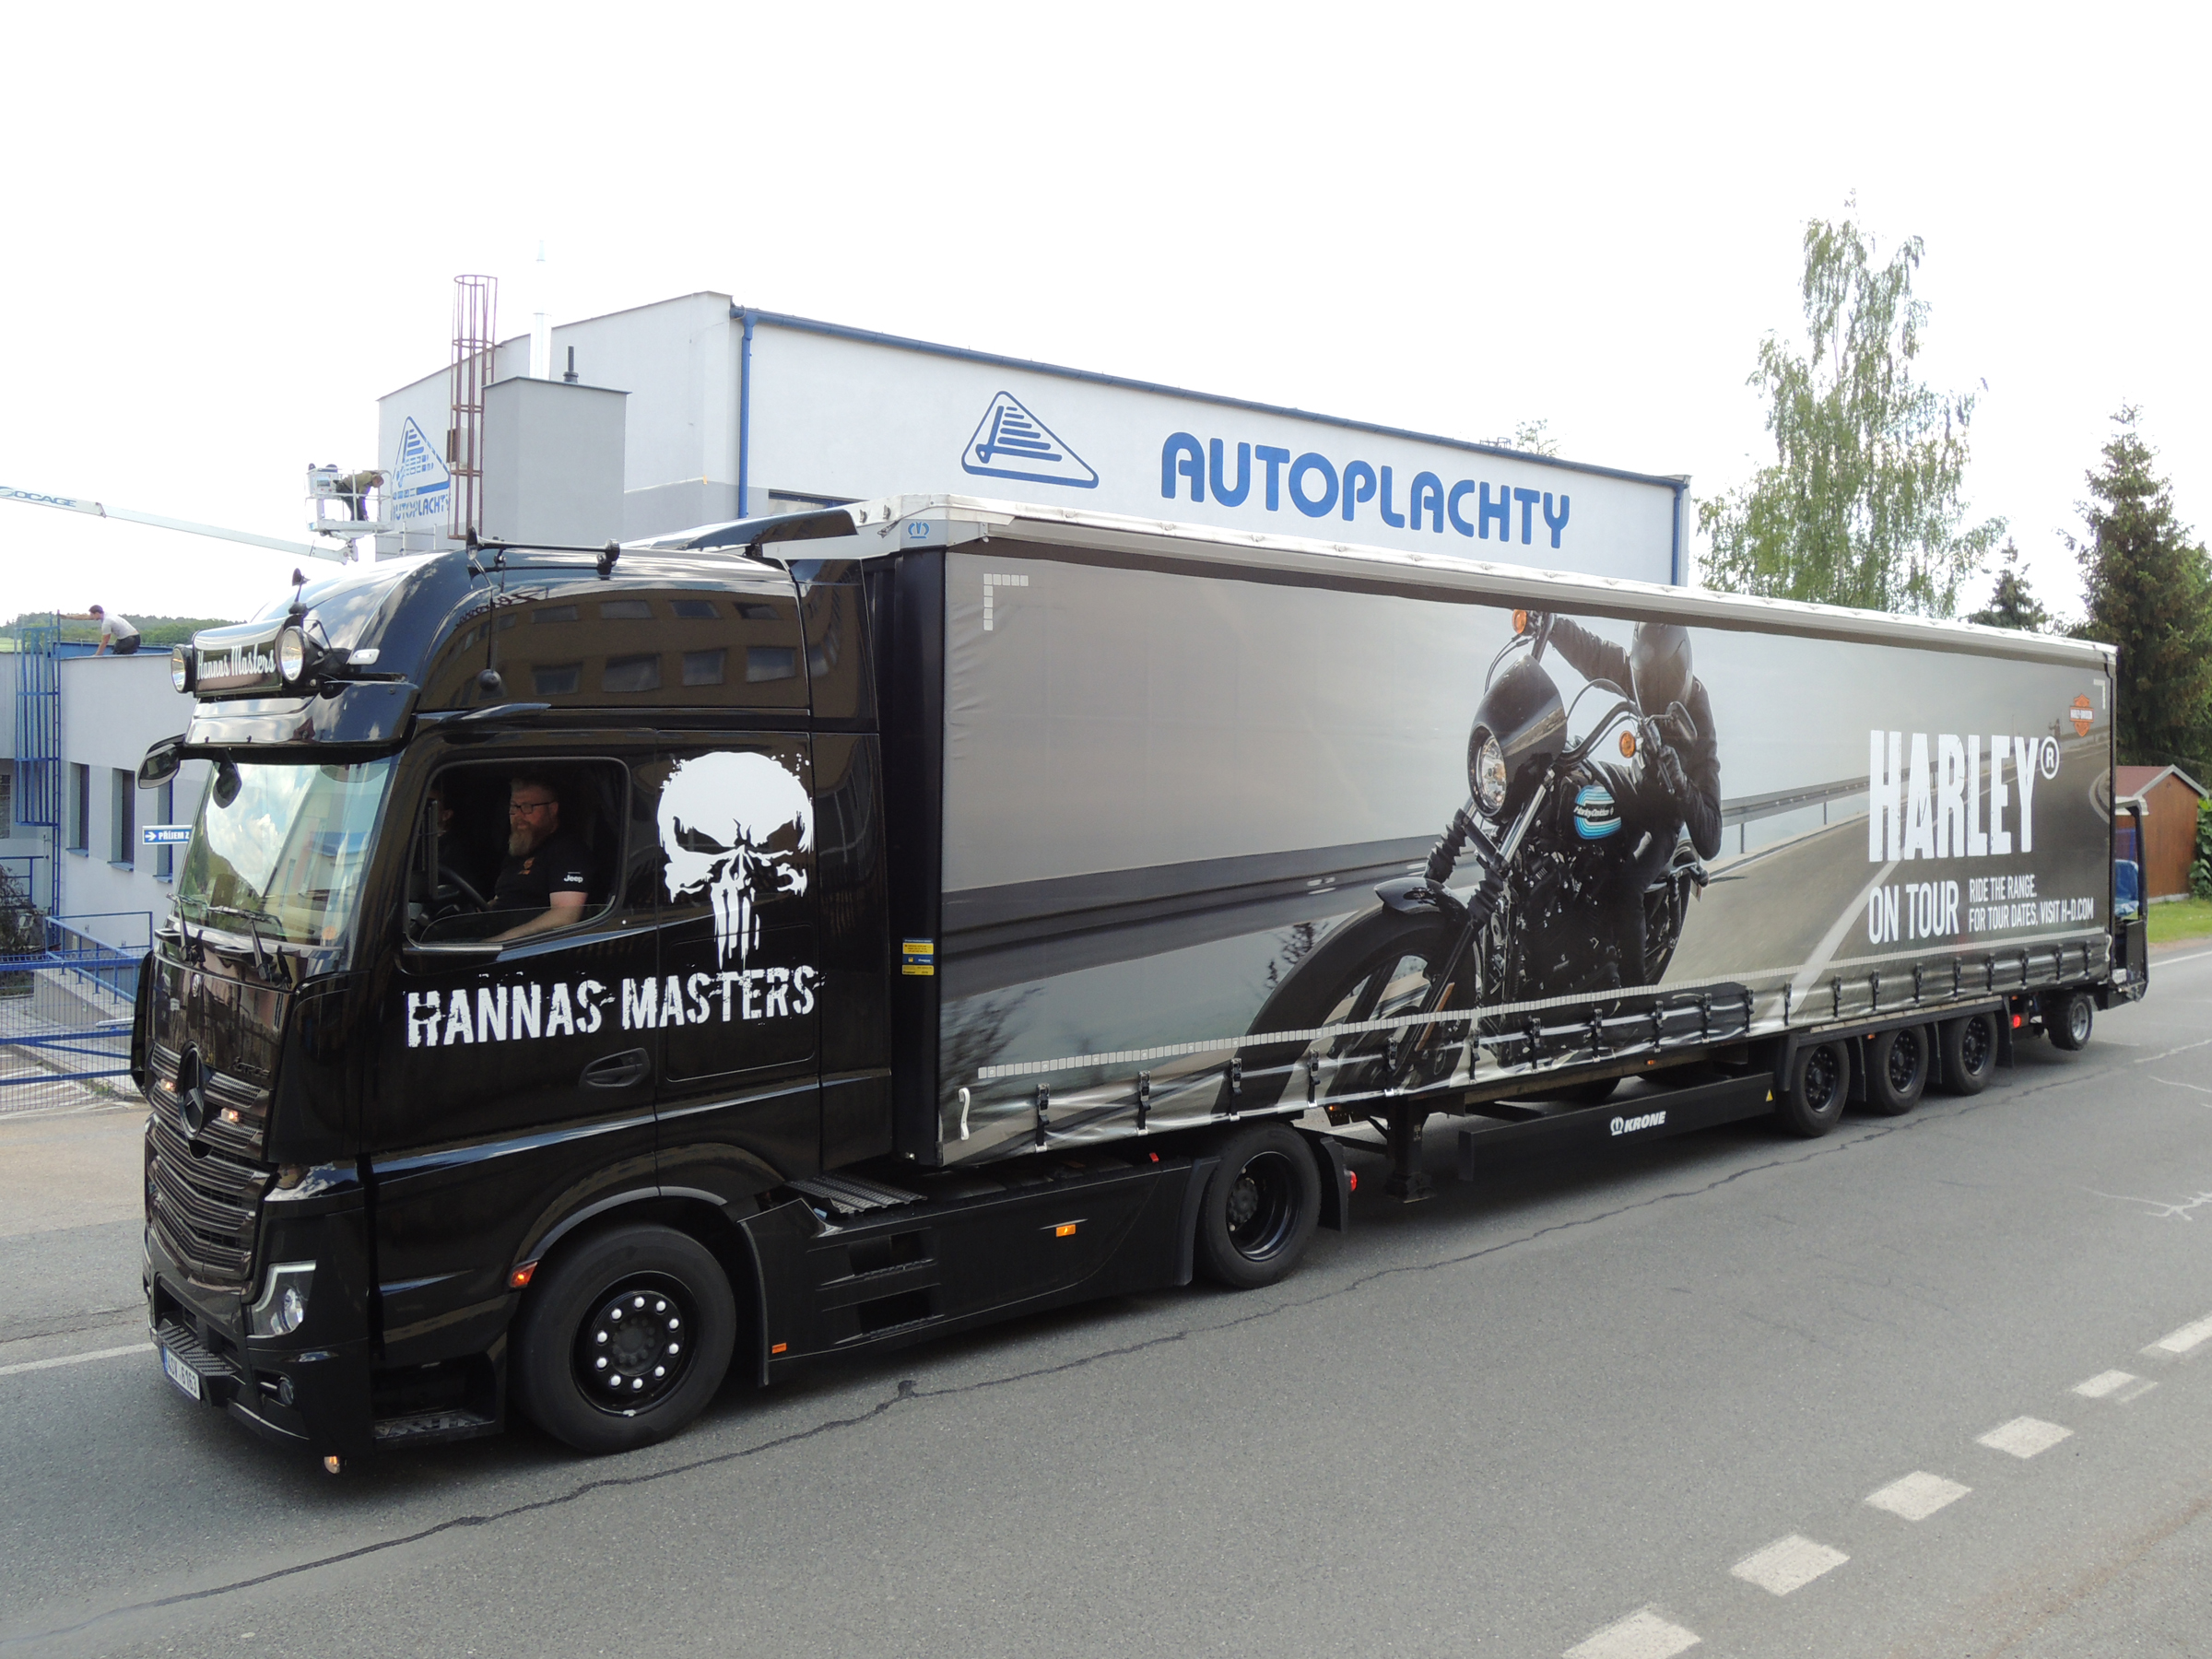 Nadjeżdża Harley on Tour 2020!